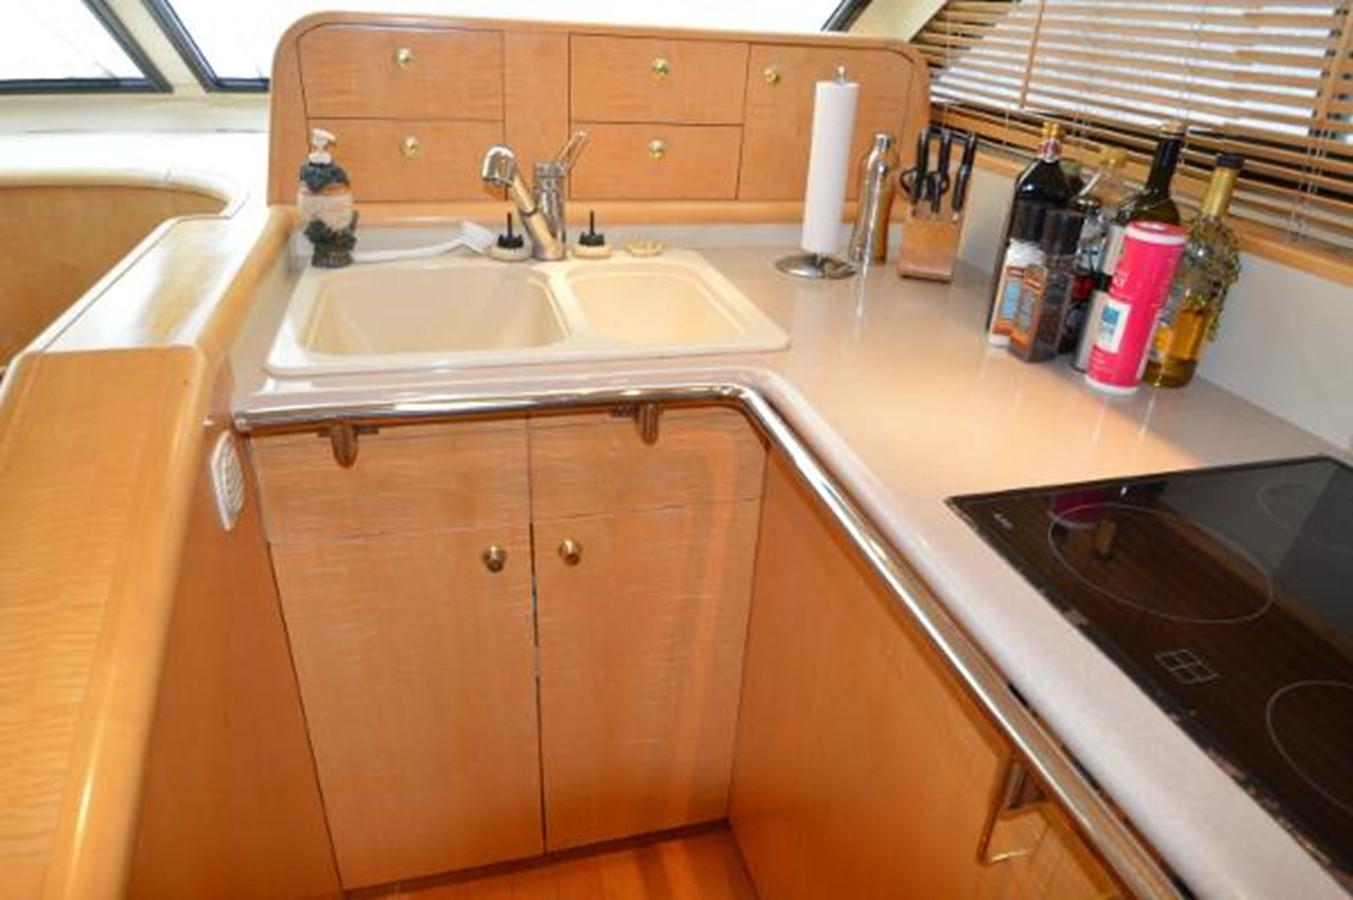 55' Neptunus - Galley Sink & Cabinets - 55 NEPTUNUS For Sale